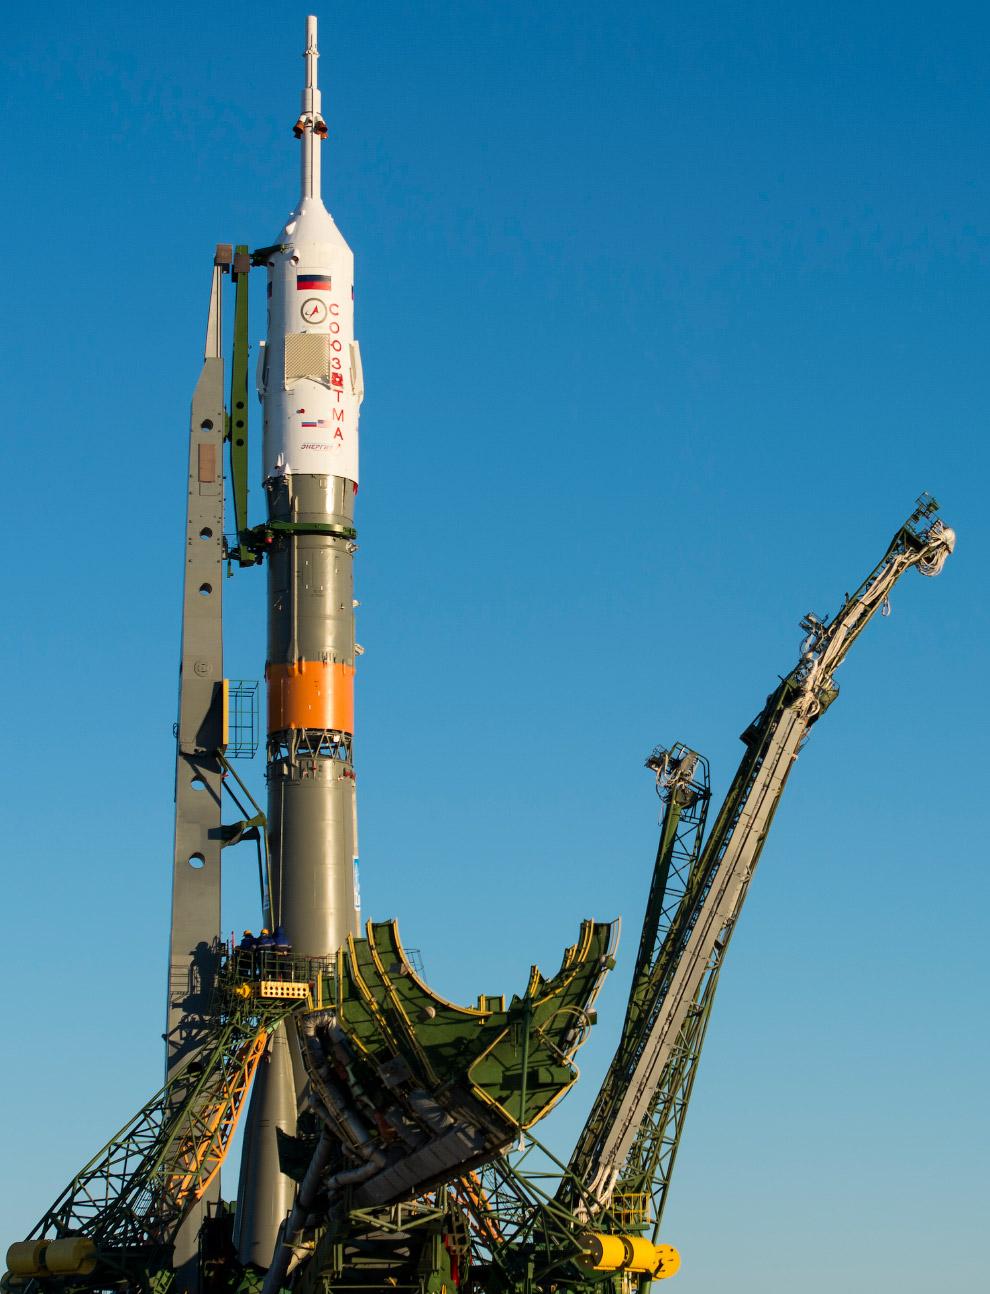 9. Космический корабль «Союз ТМА-19М», Байконур, 13 декабря 2015. (Фото NASA | Joel Kowsky):<br